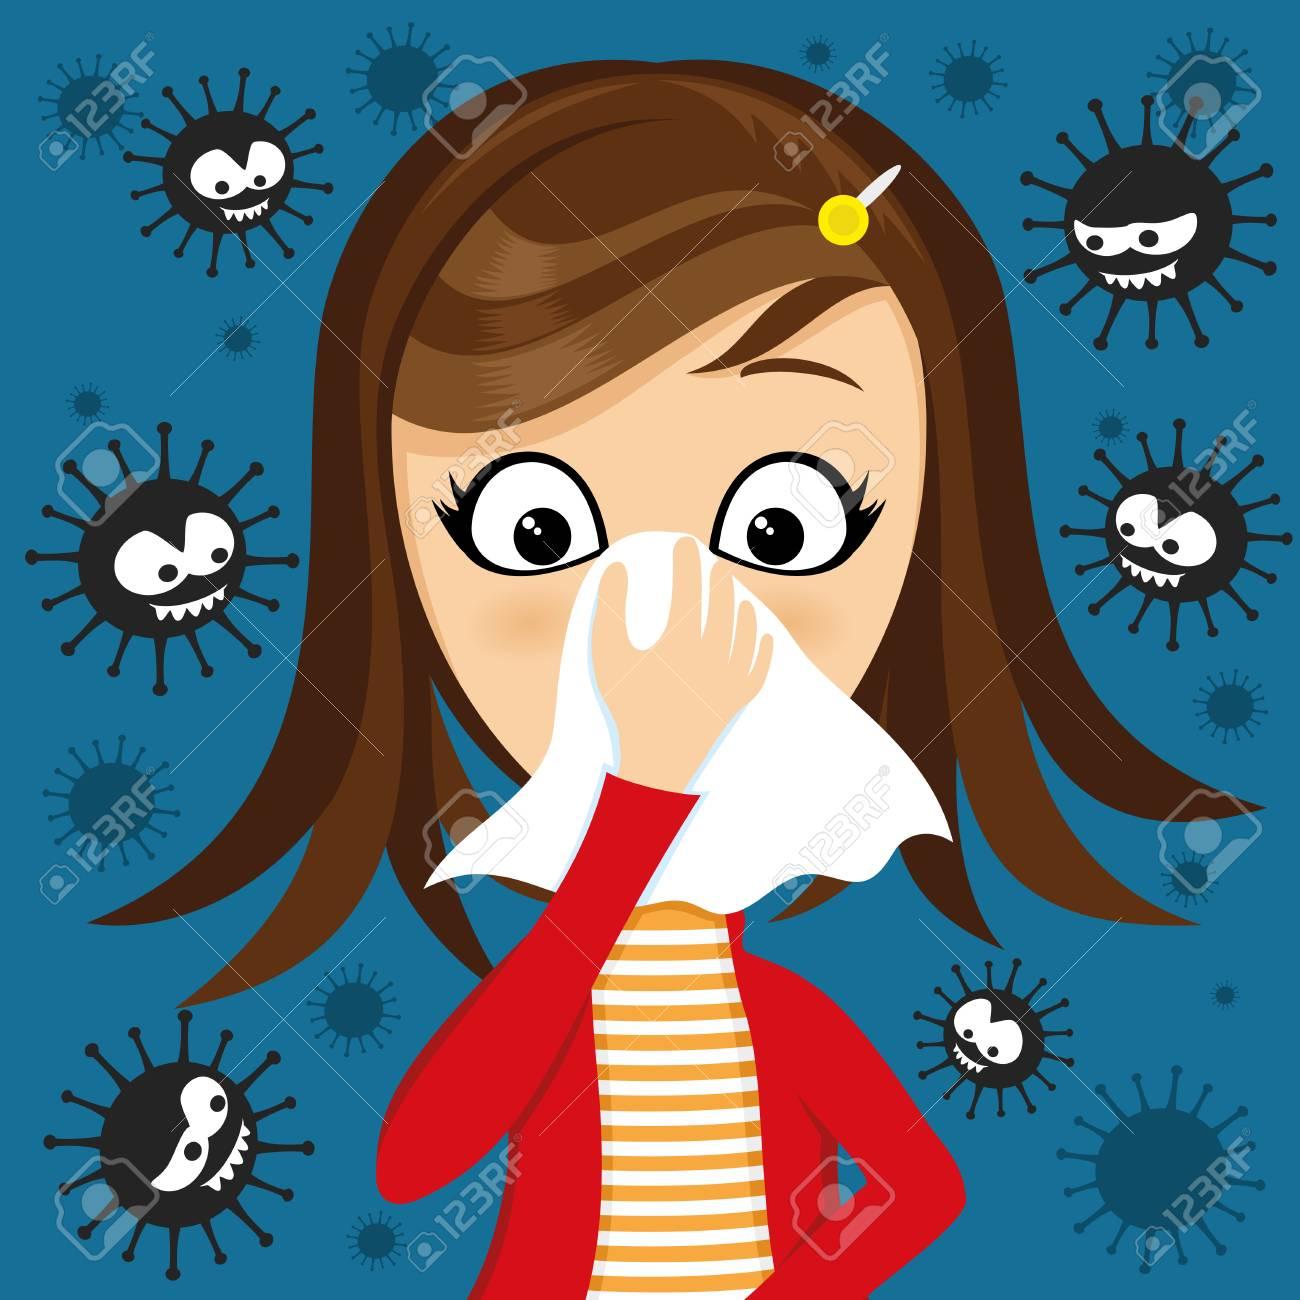 Girl has runny nose and viruses around. - 110687887